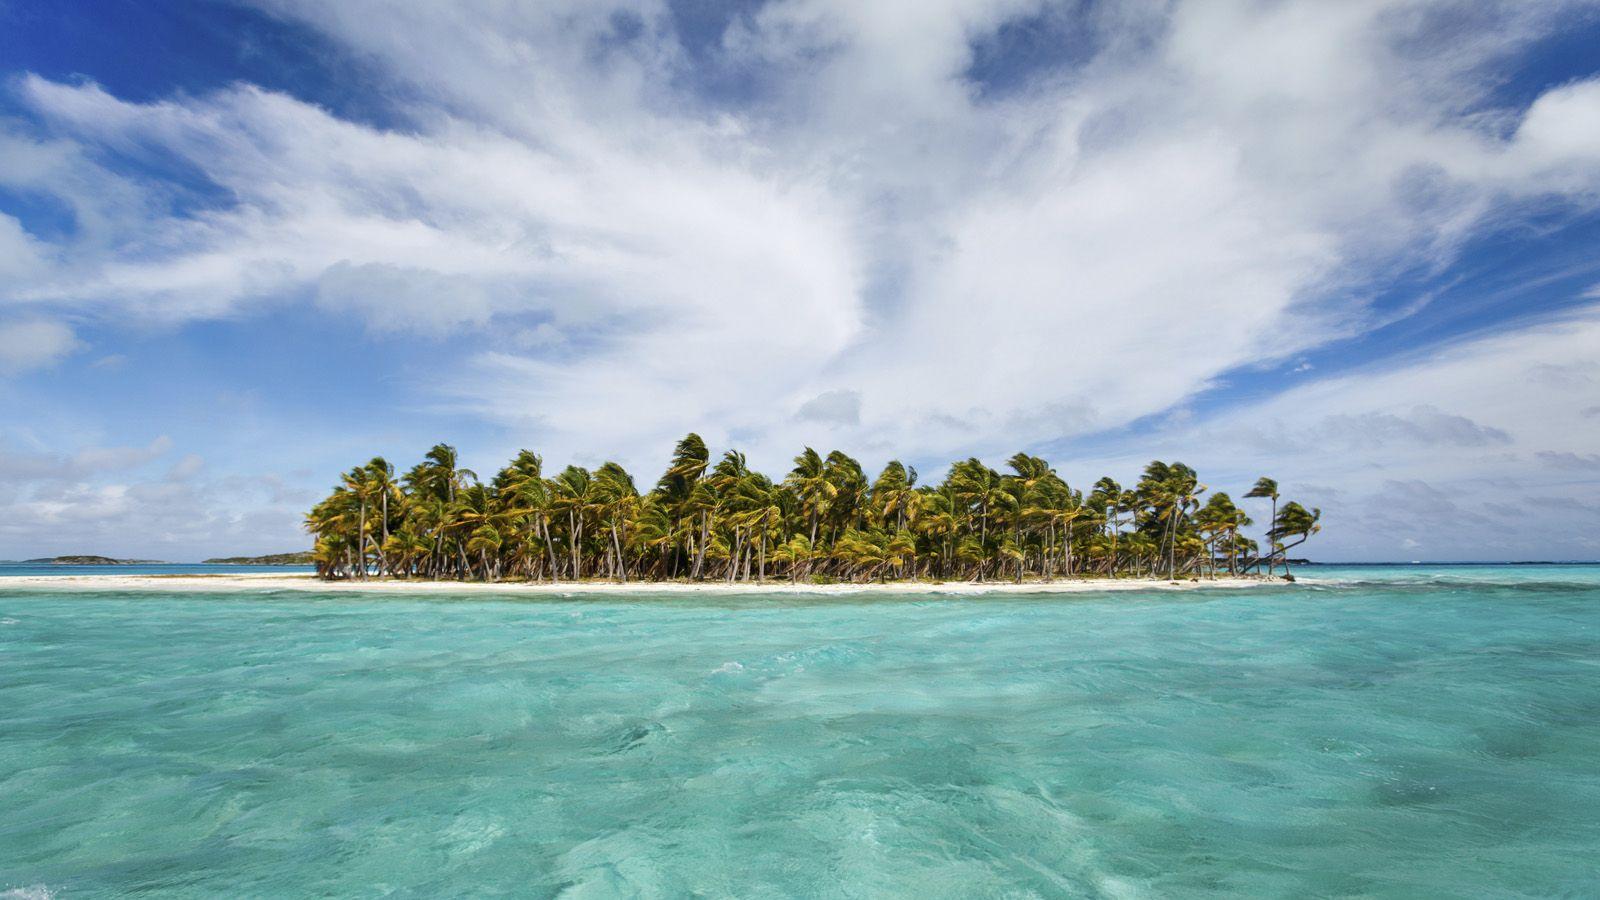 An island in the Exumas archipelago of the Bahamas